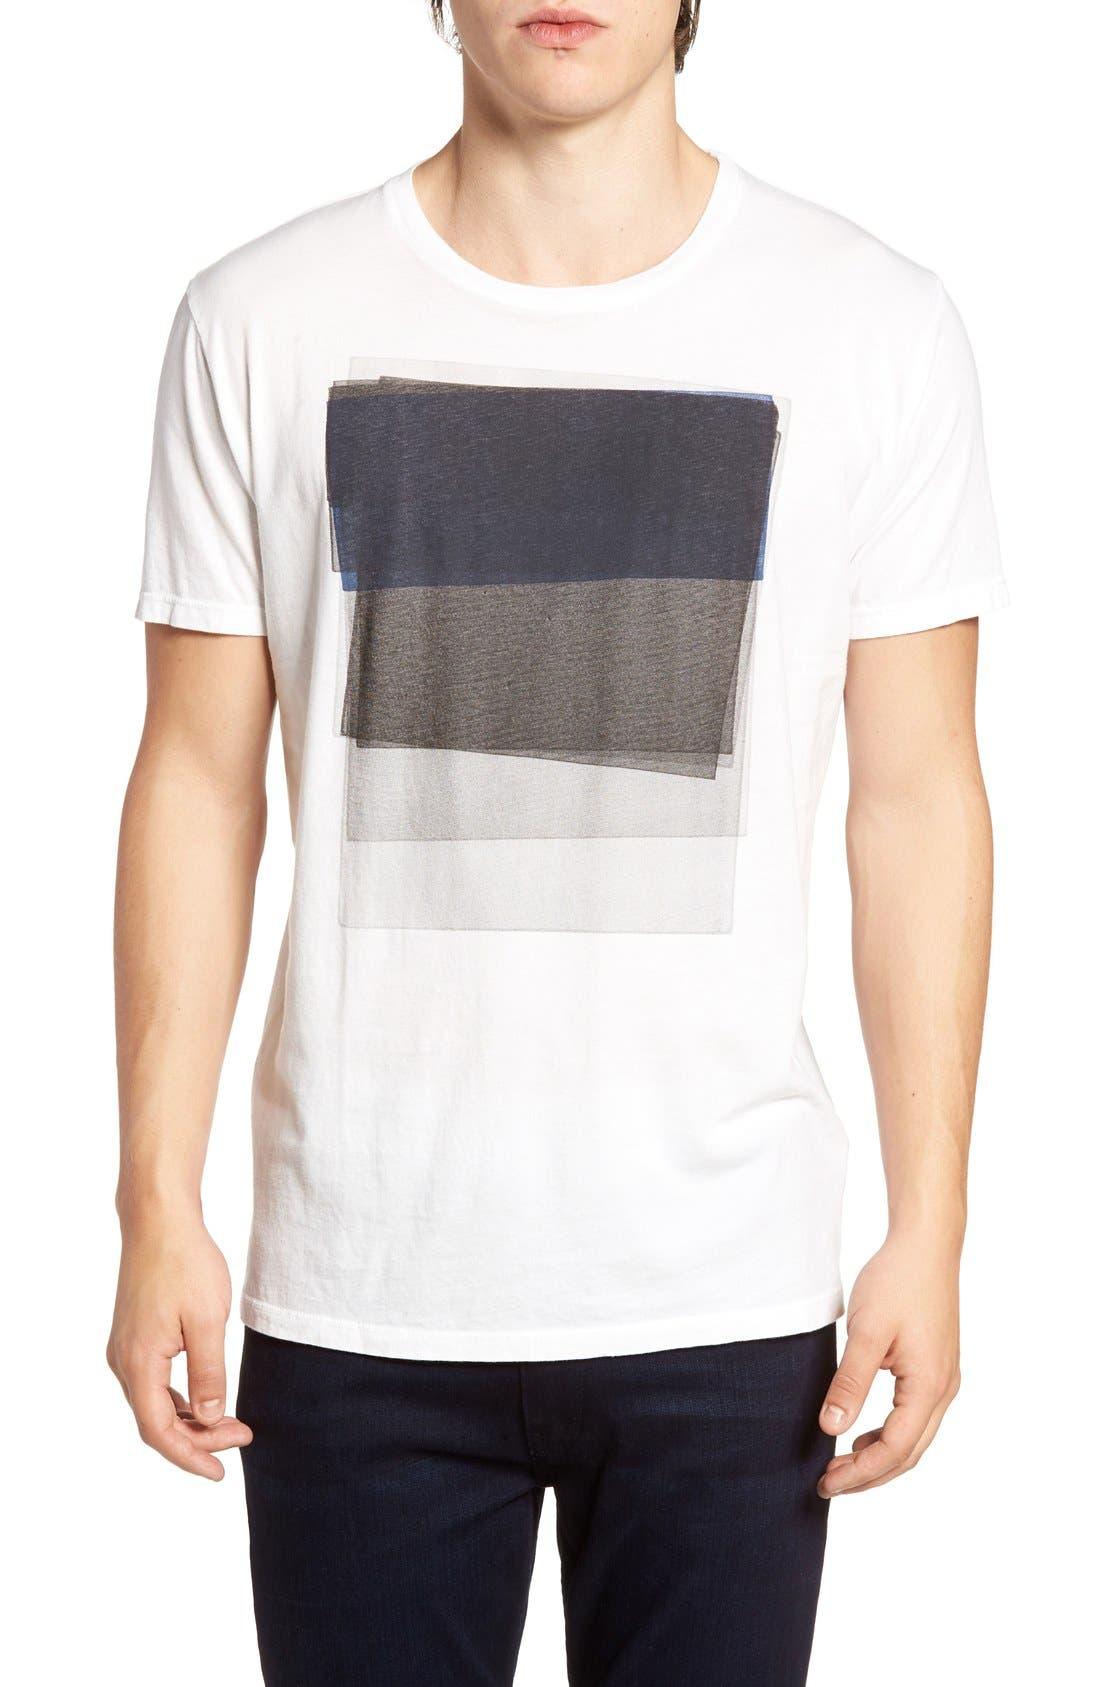 Alternate Image 1 Selected - Vestige Sunken Graphic T-Shirt